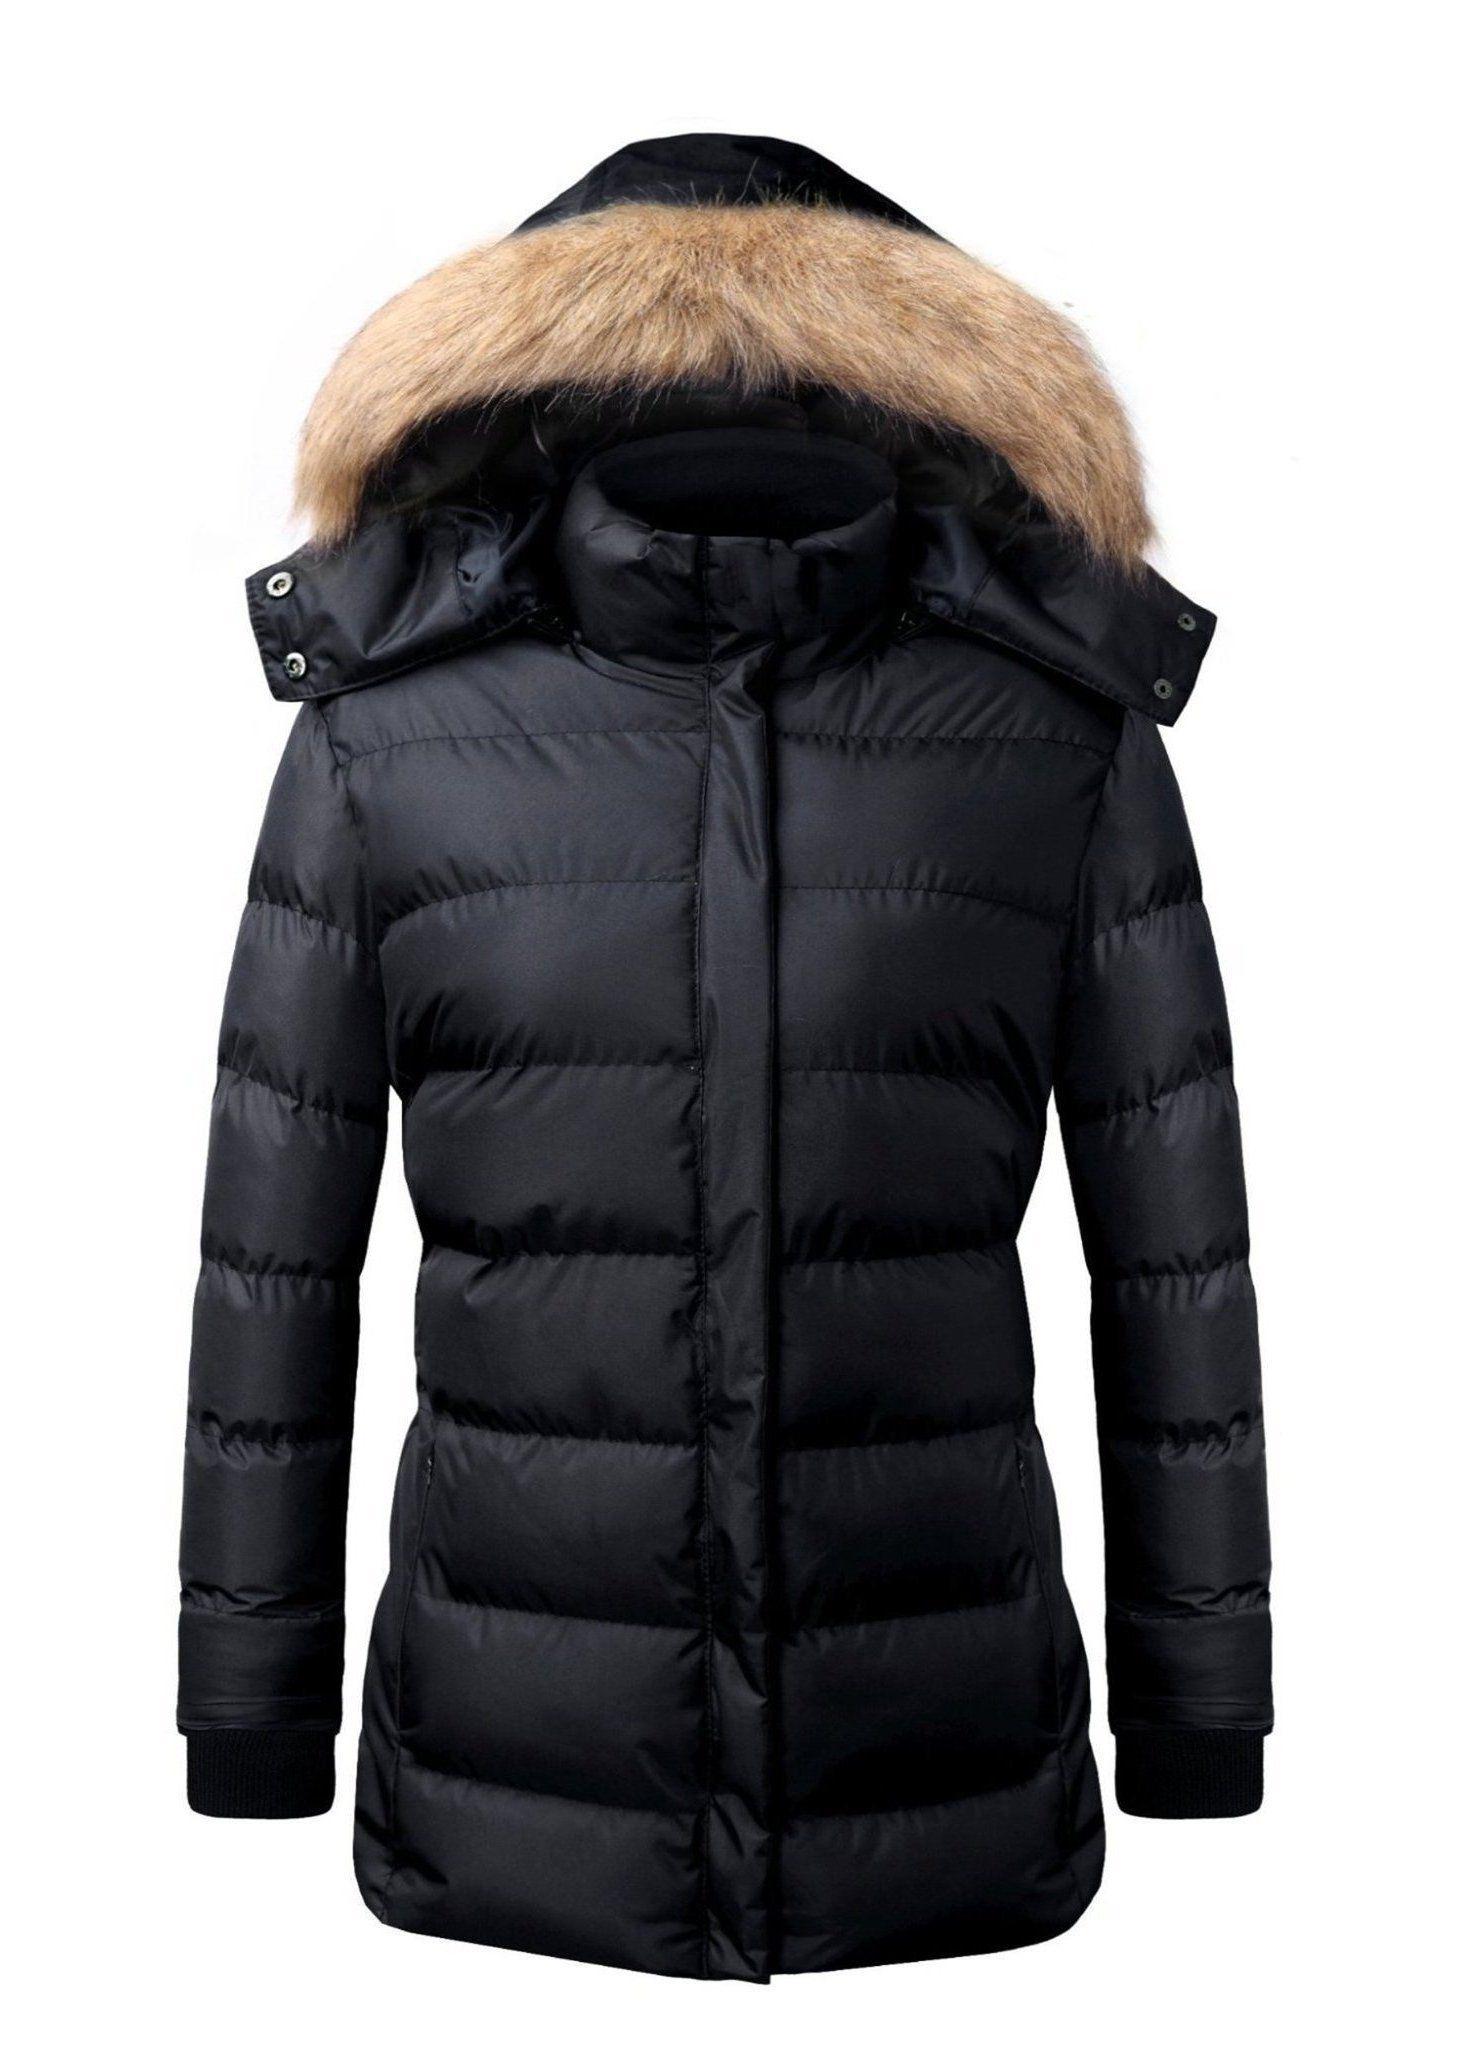 Women Jacket Coat Down Padded Hoody Praka Full Length Outwear Overcoat Winter nw